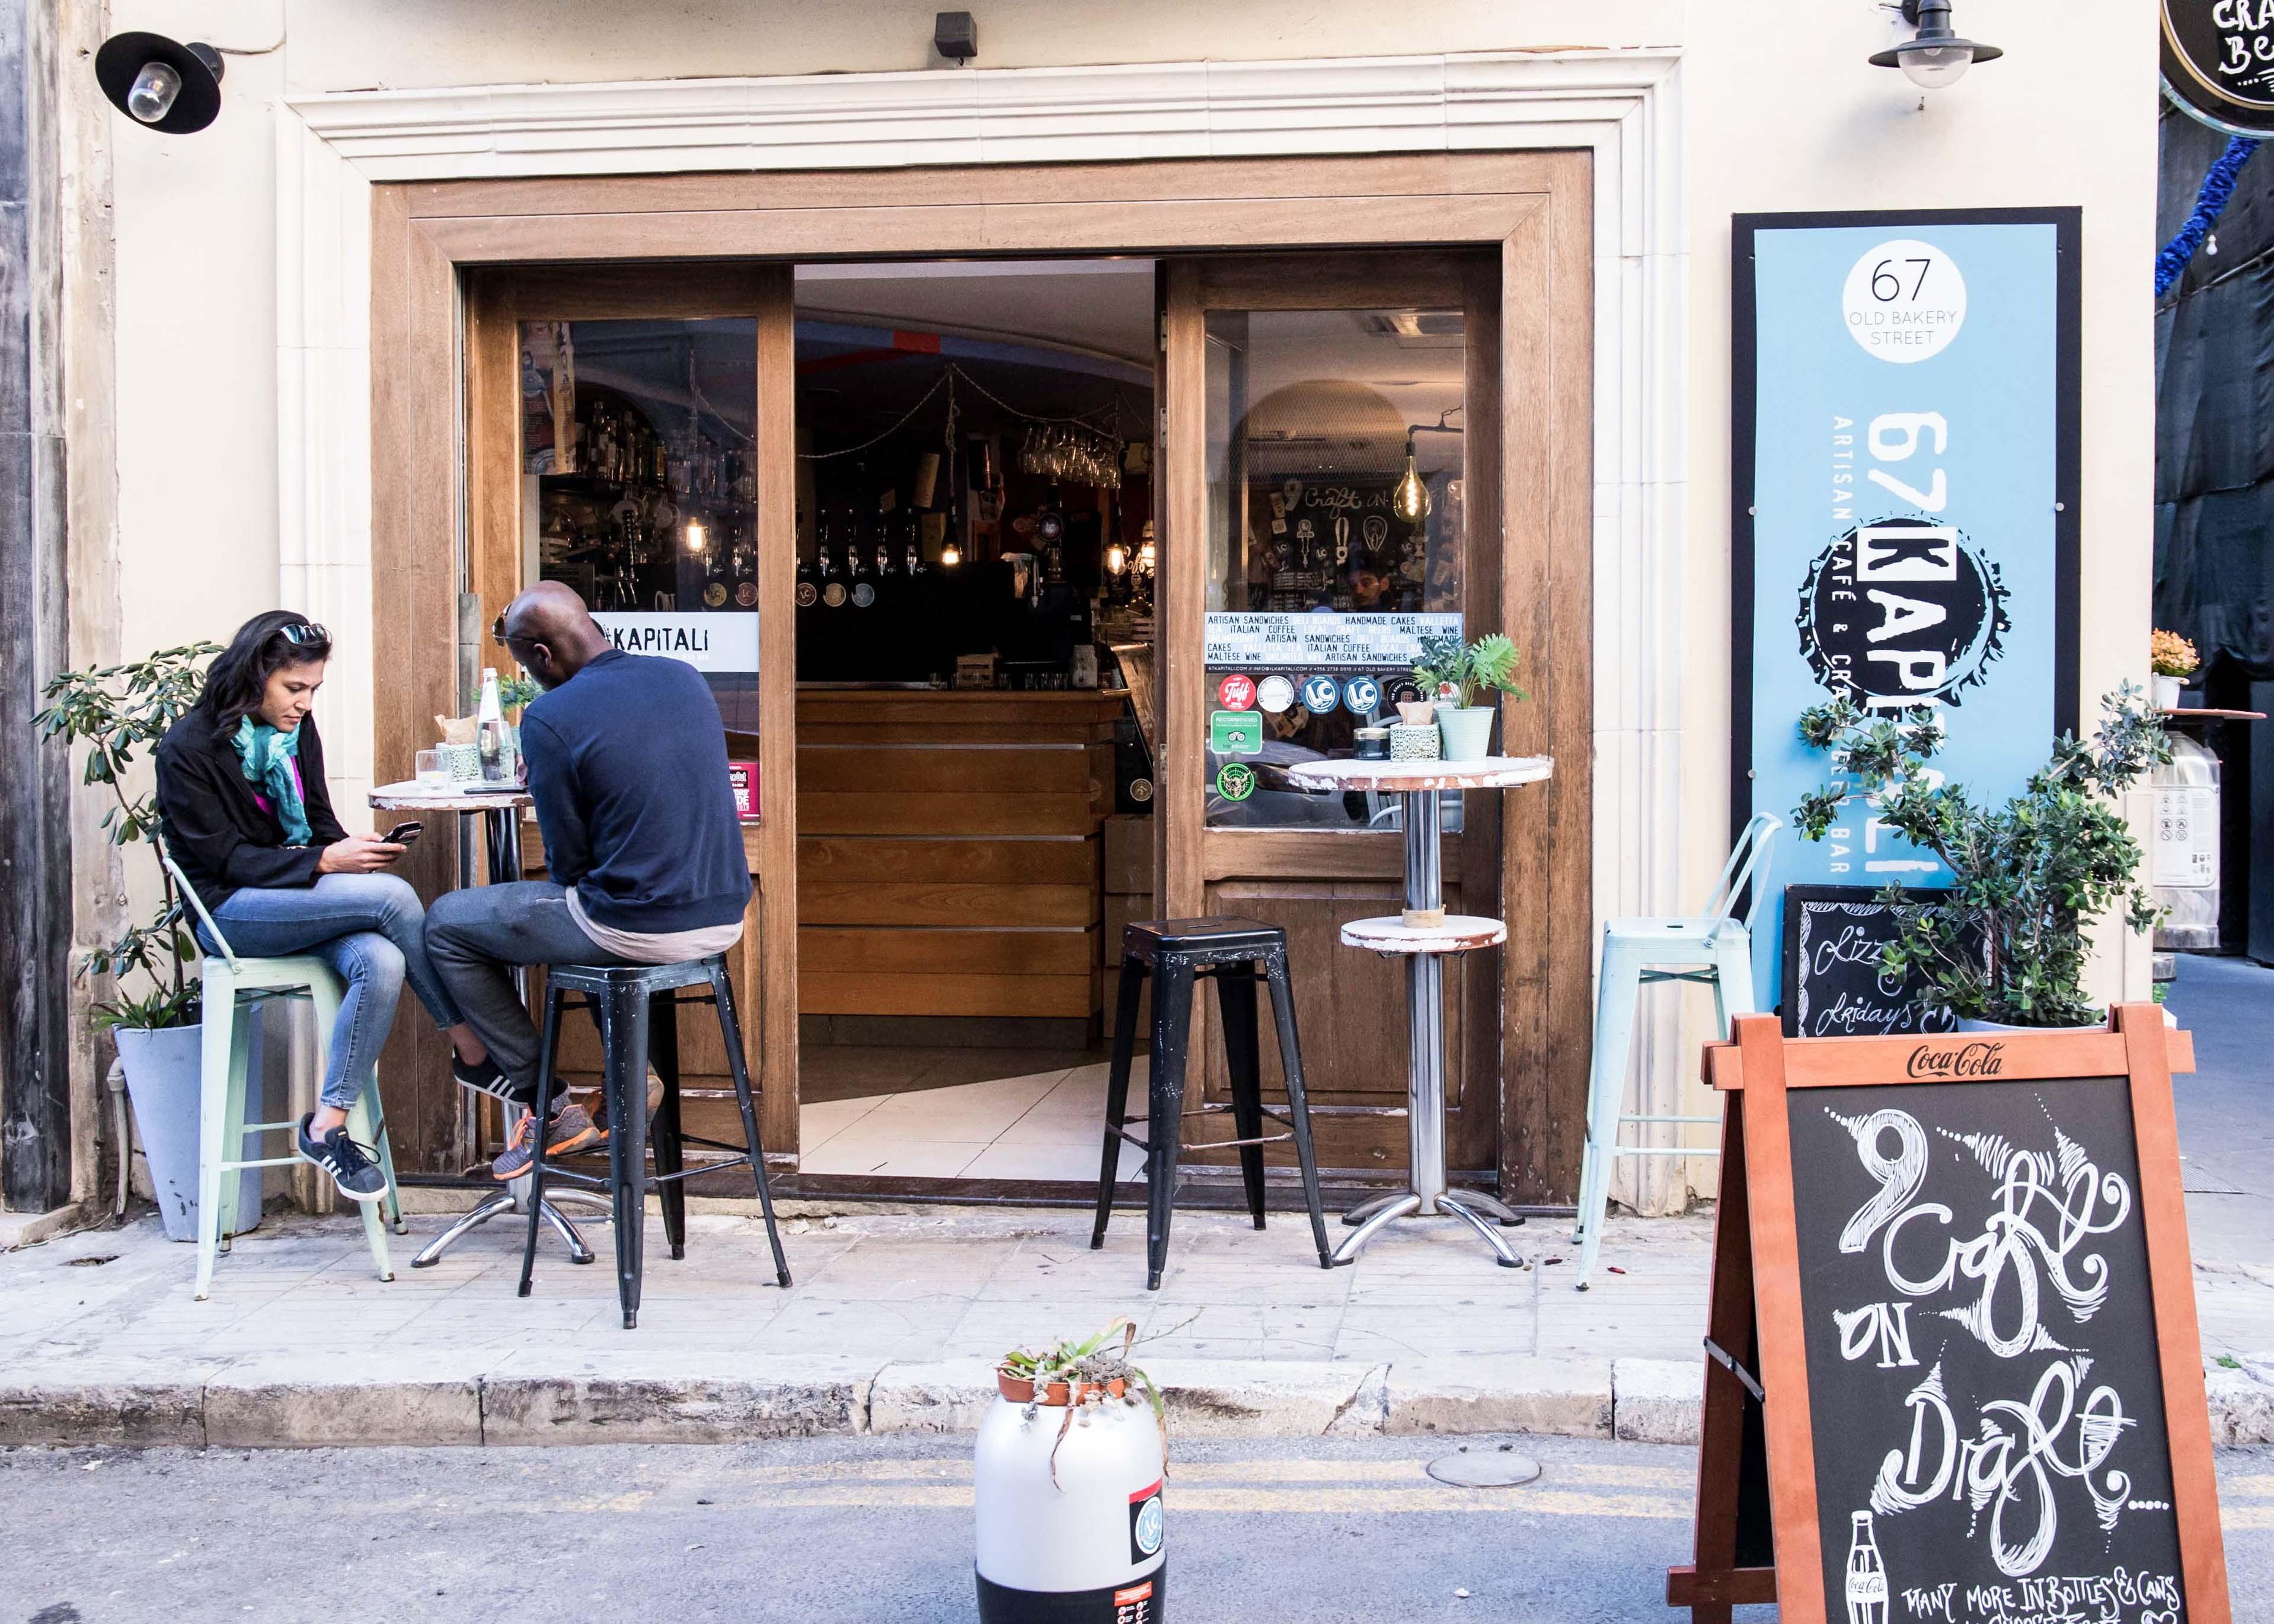 Cafe and bat in Valletta, 67 Kapitali